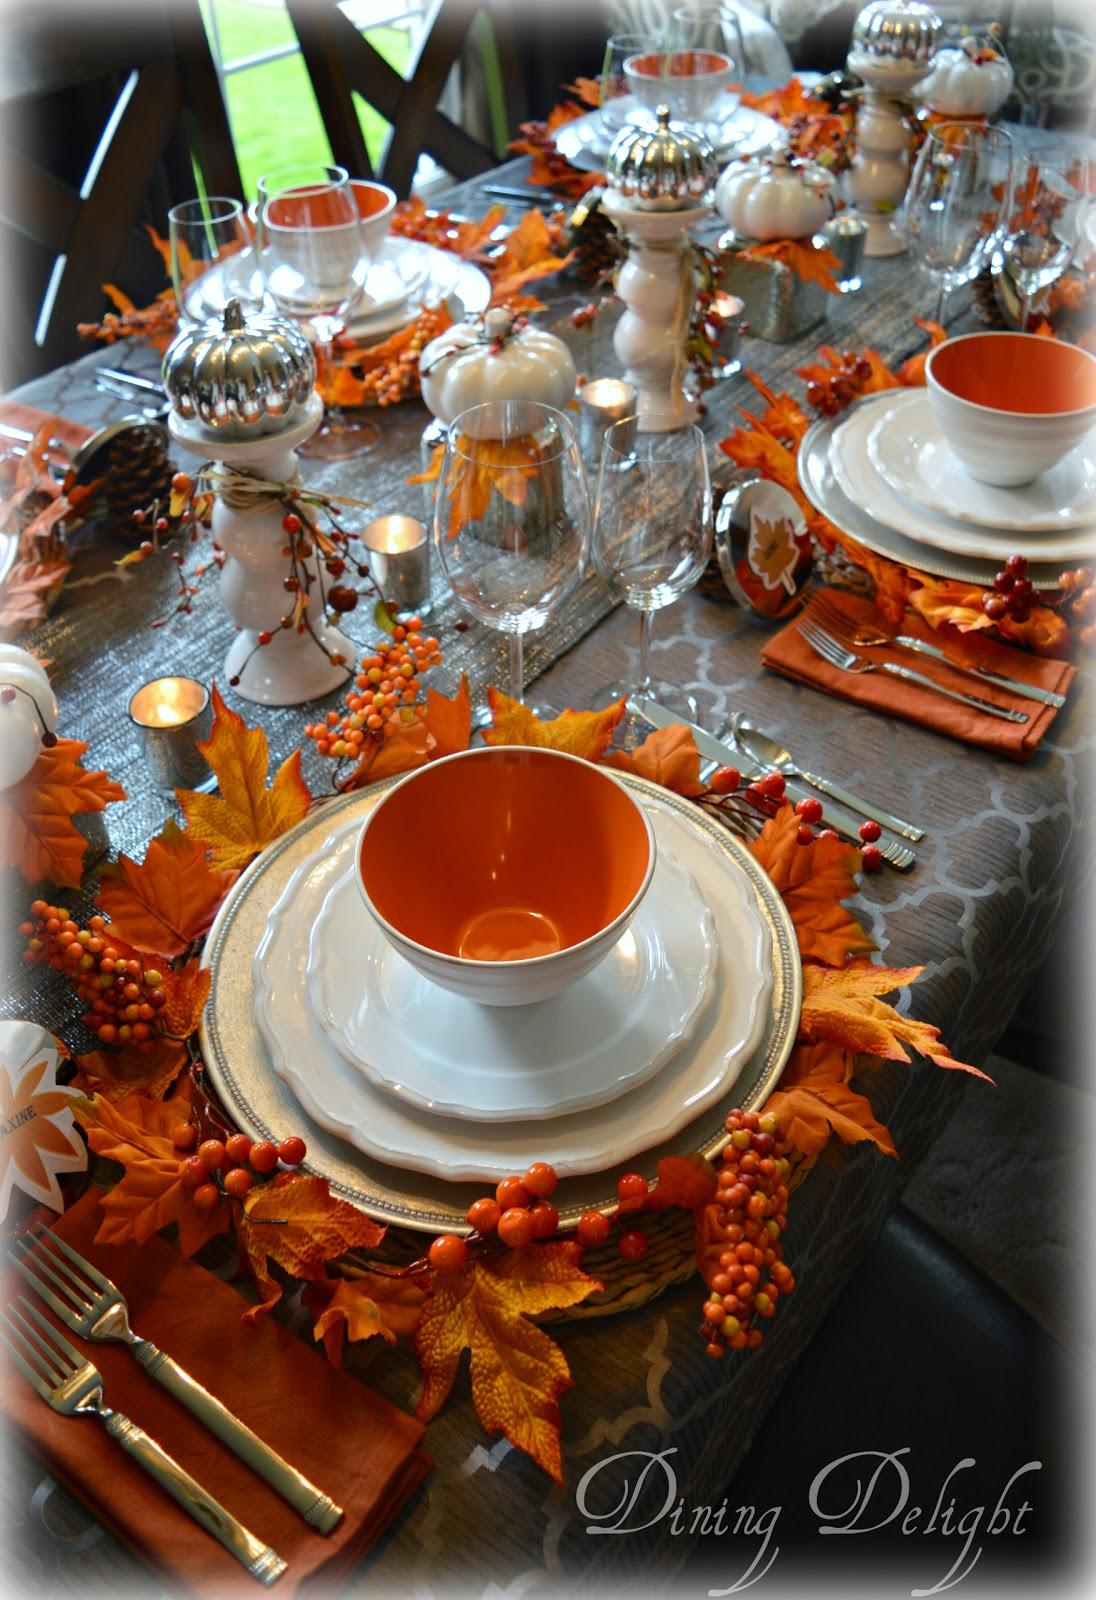 Dining Delight Fall Tablescape In Orange White Amp Gray